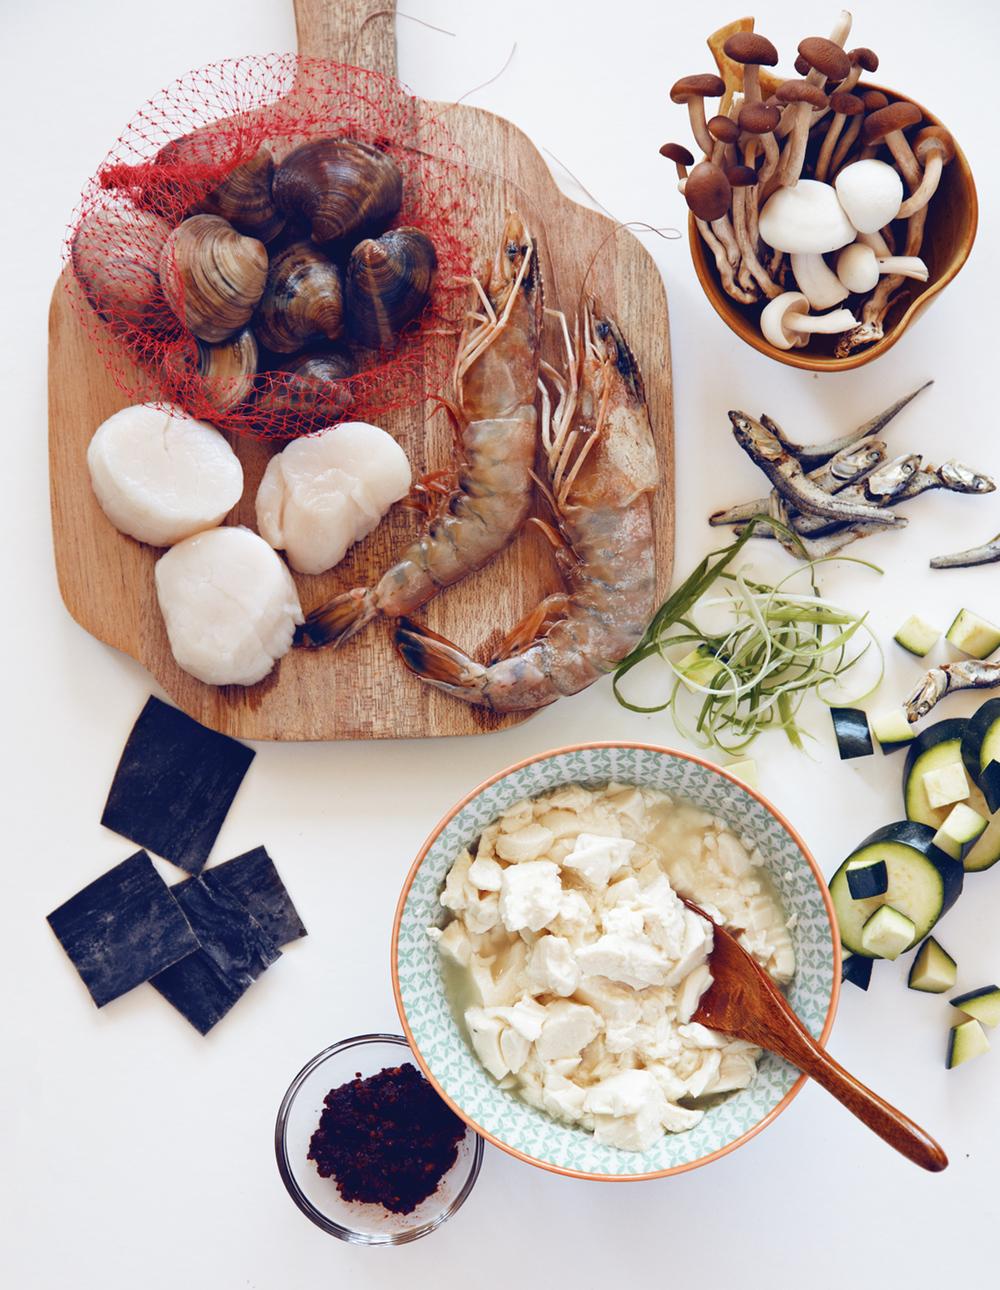 Ilasco_Styling_Anthology-Cho-stew-ingredients.jpg